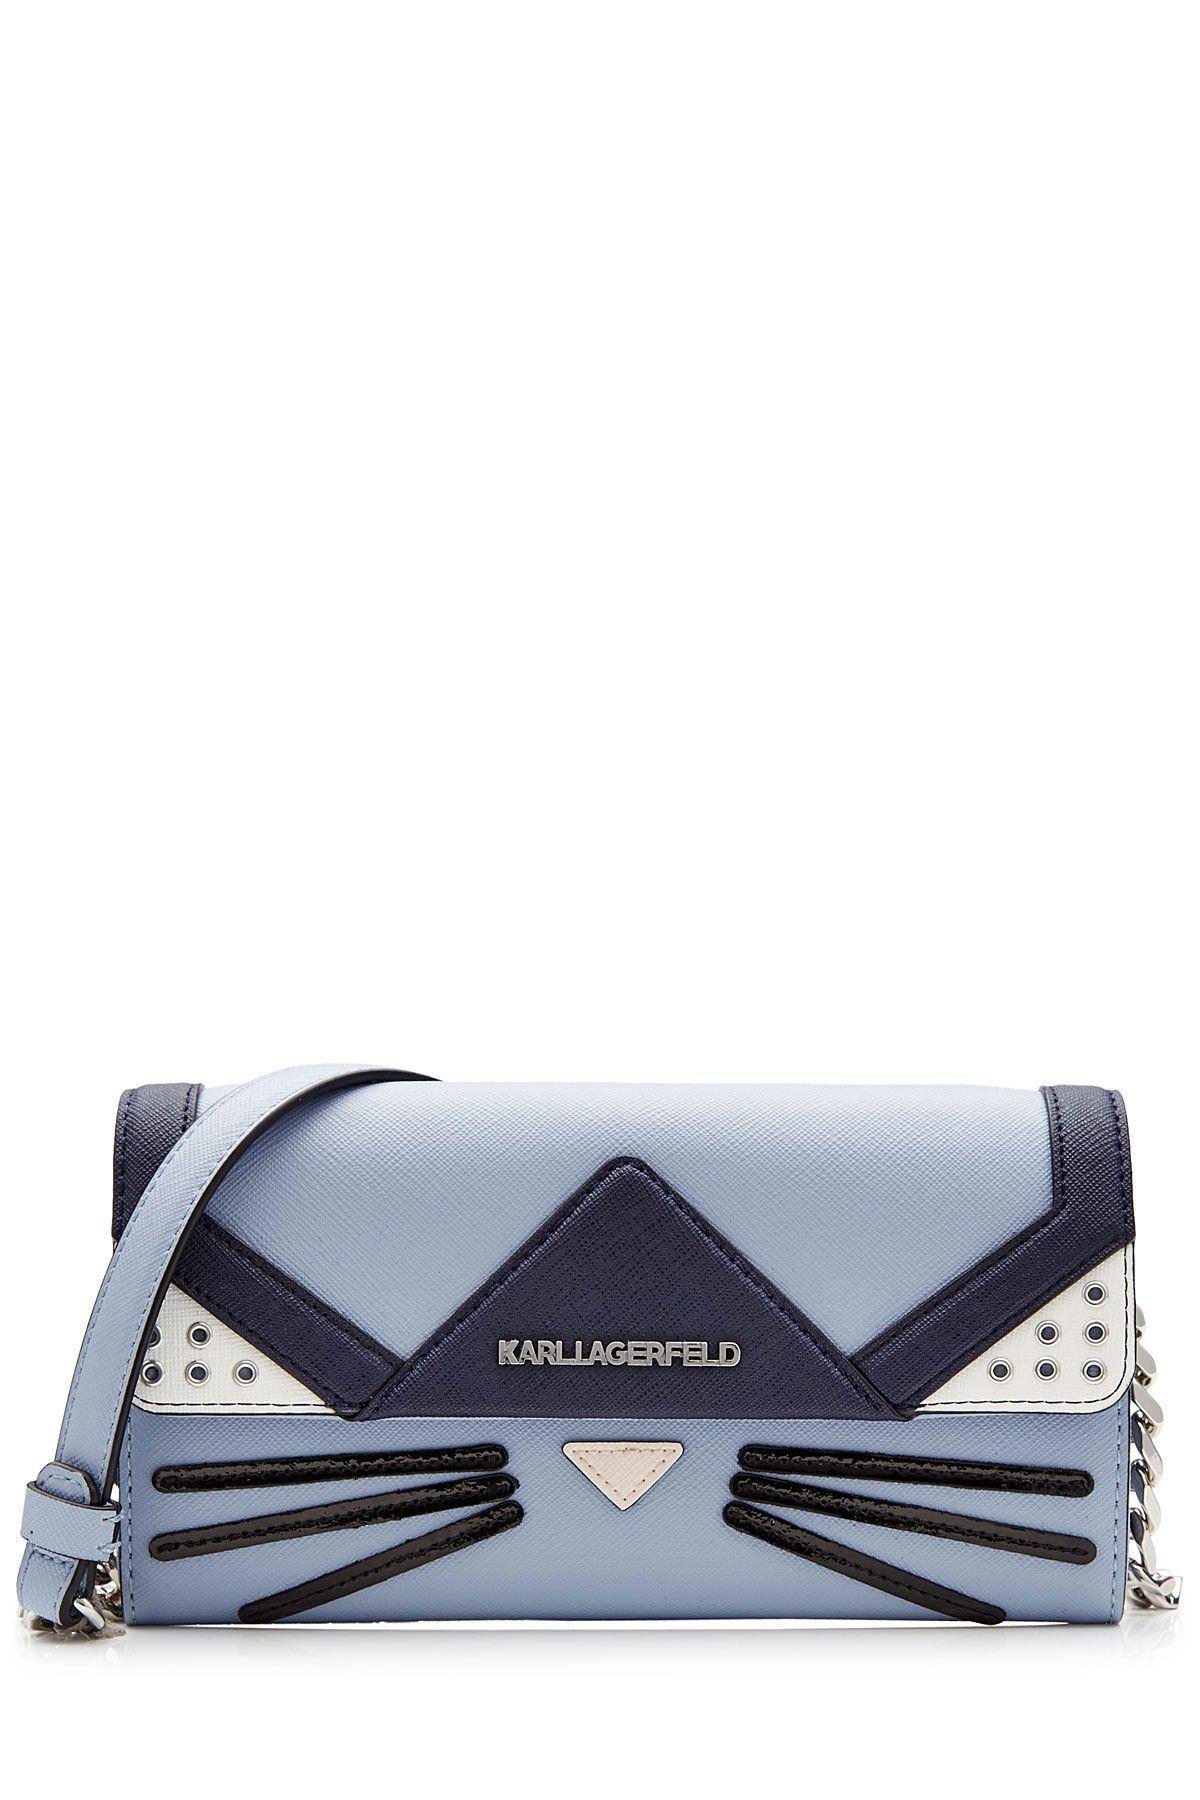 Cat Crossbody Mini Shoulder Bag From Karl Lagerfeld Luxury Fashion